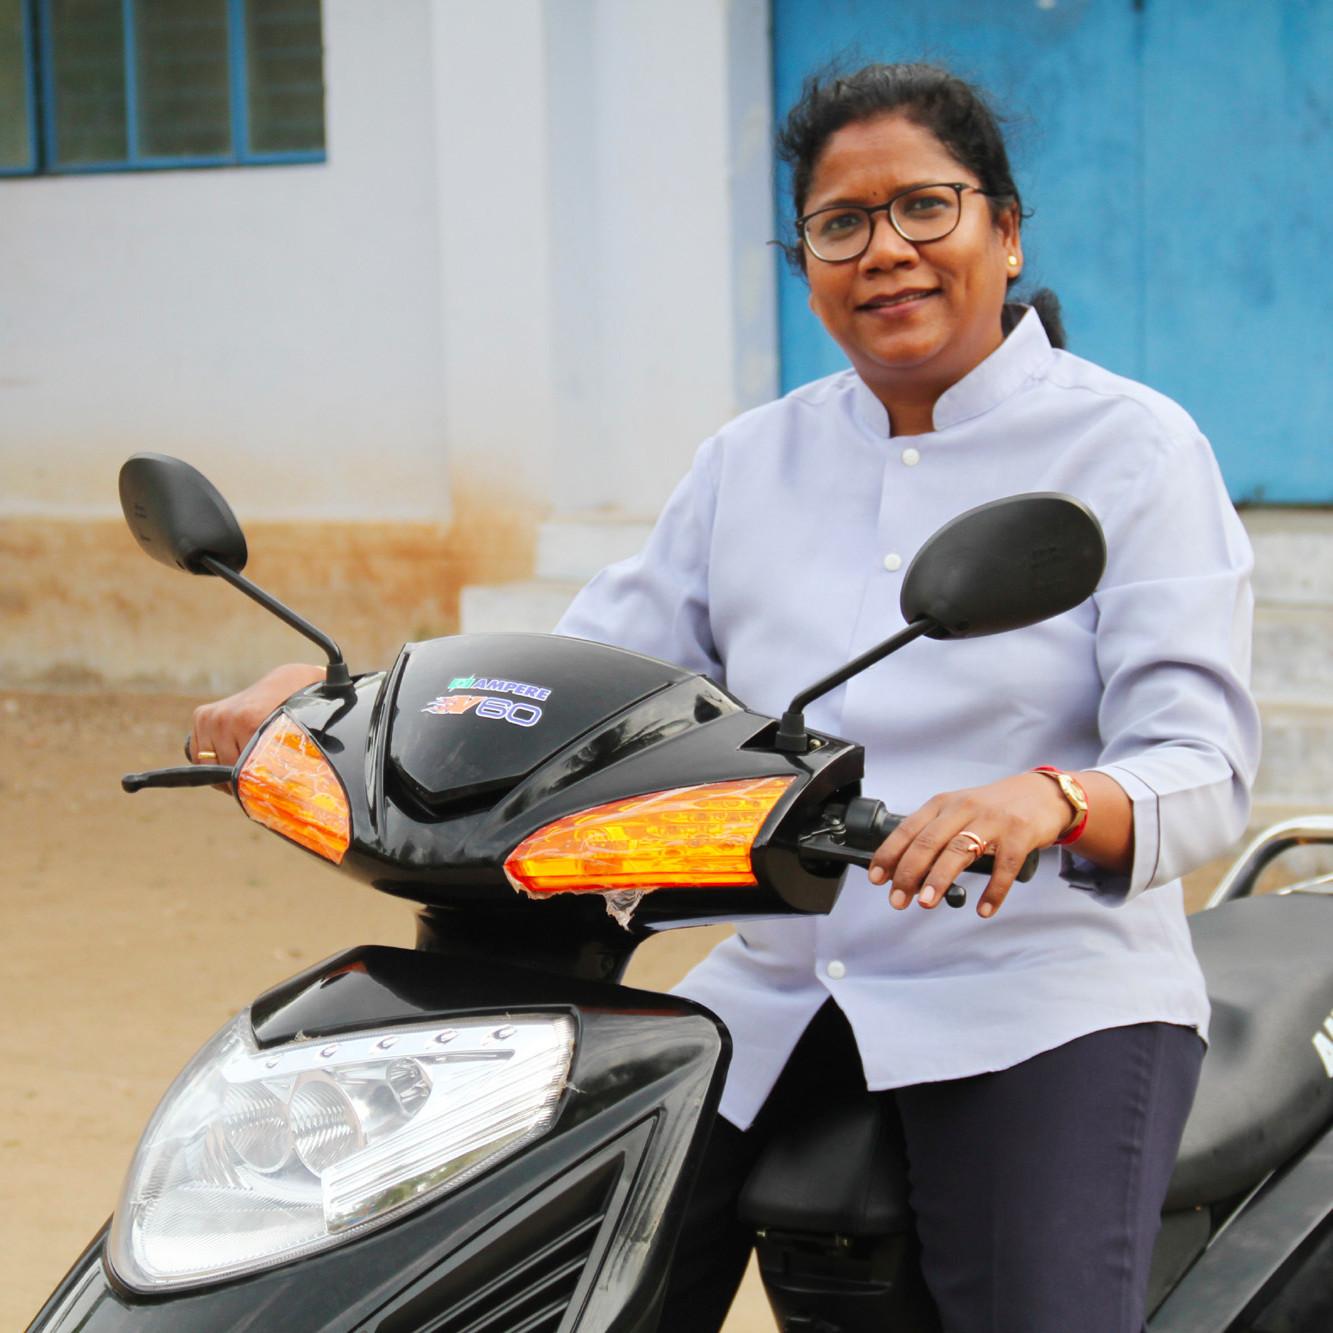 Hemalatha Annamalai